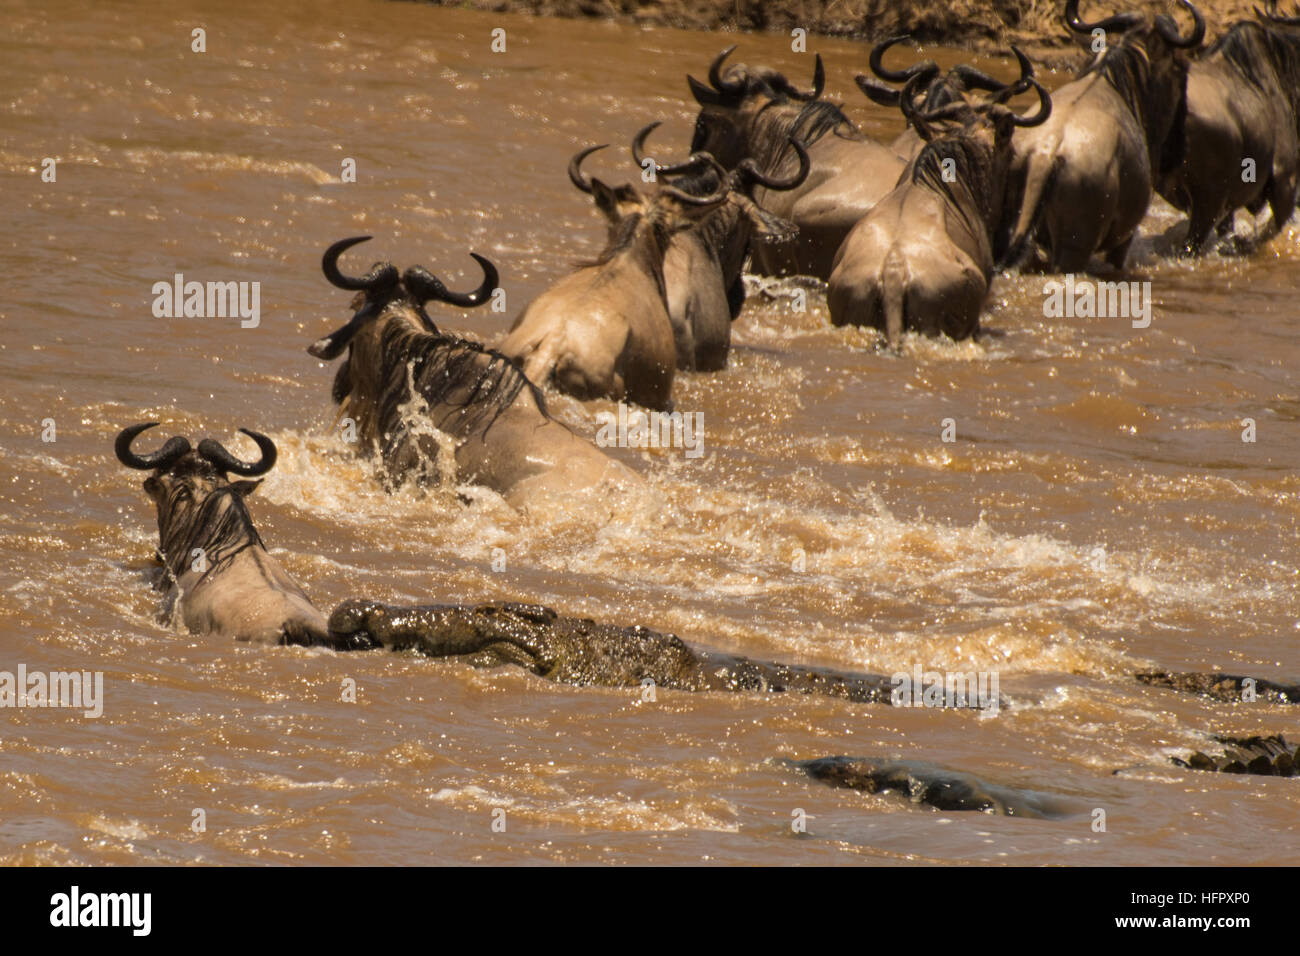 Crocodile attacking wildebeeste - Stock Image